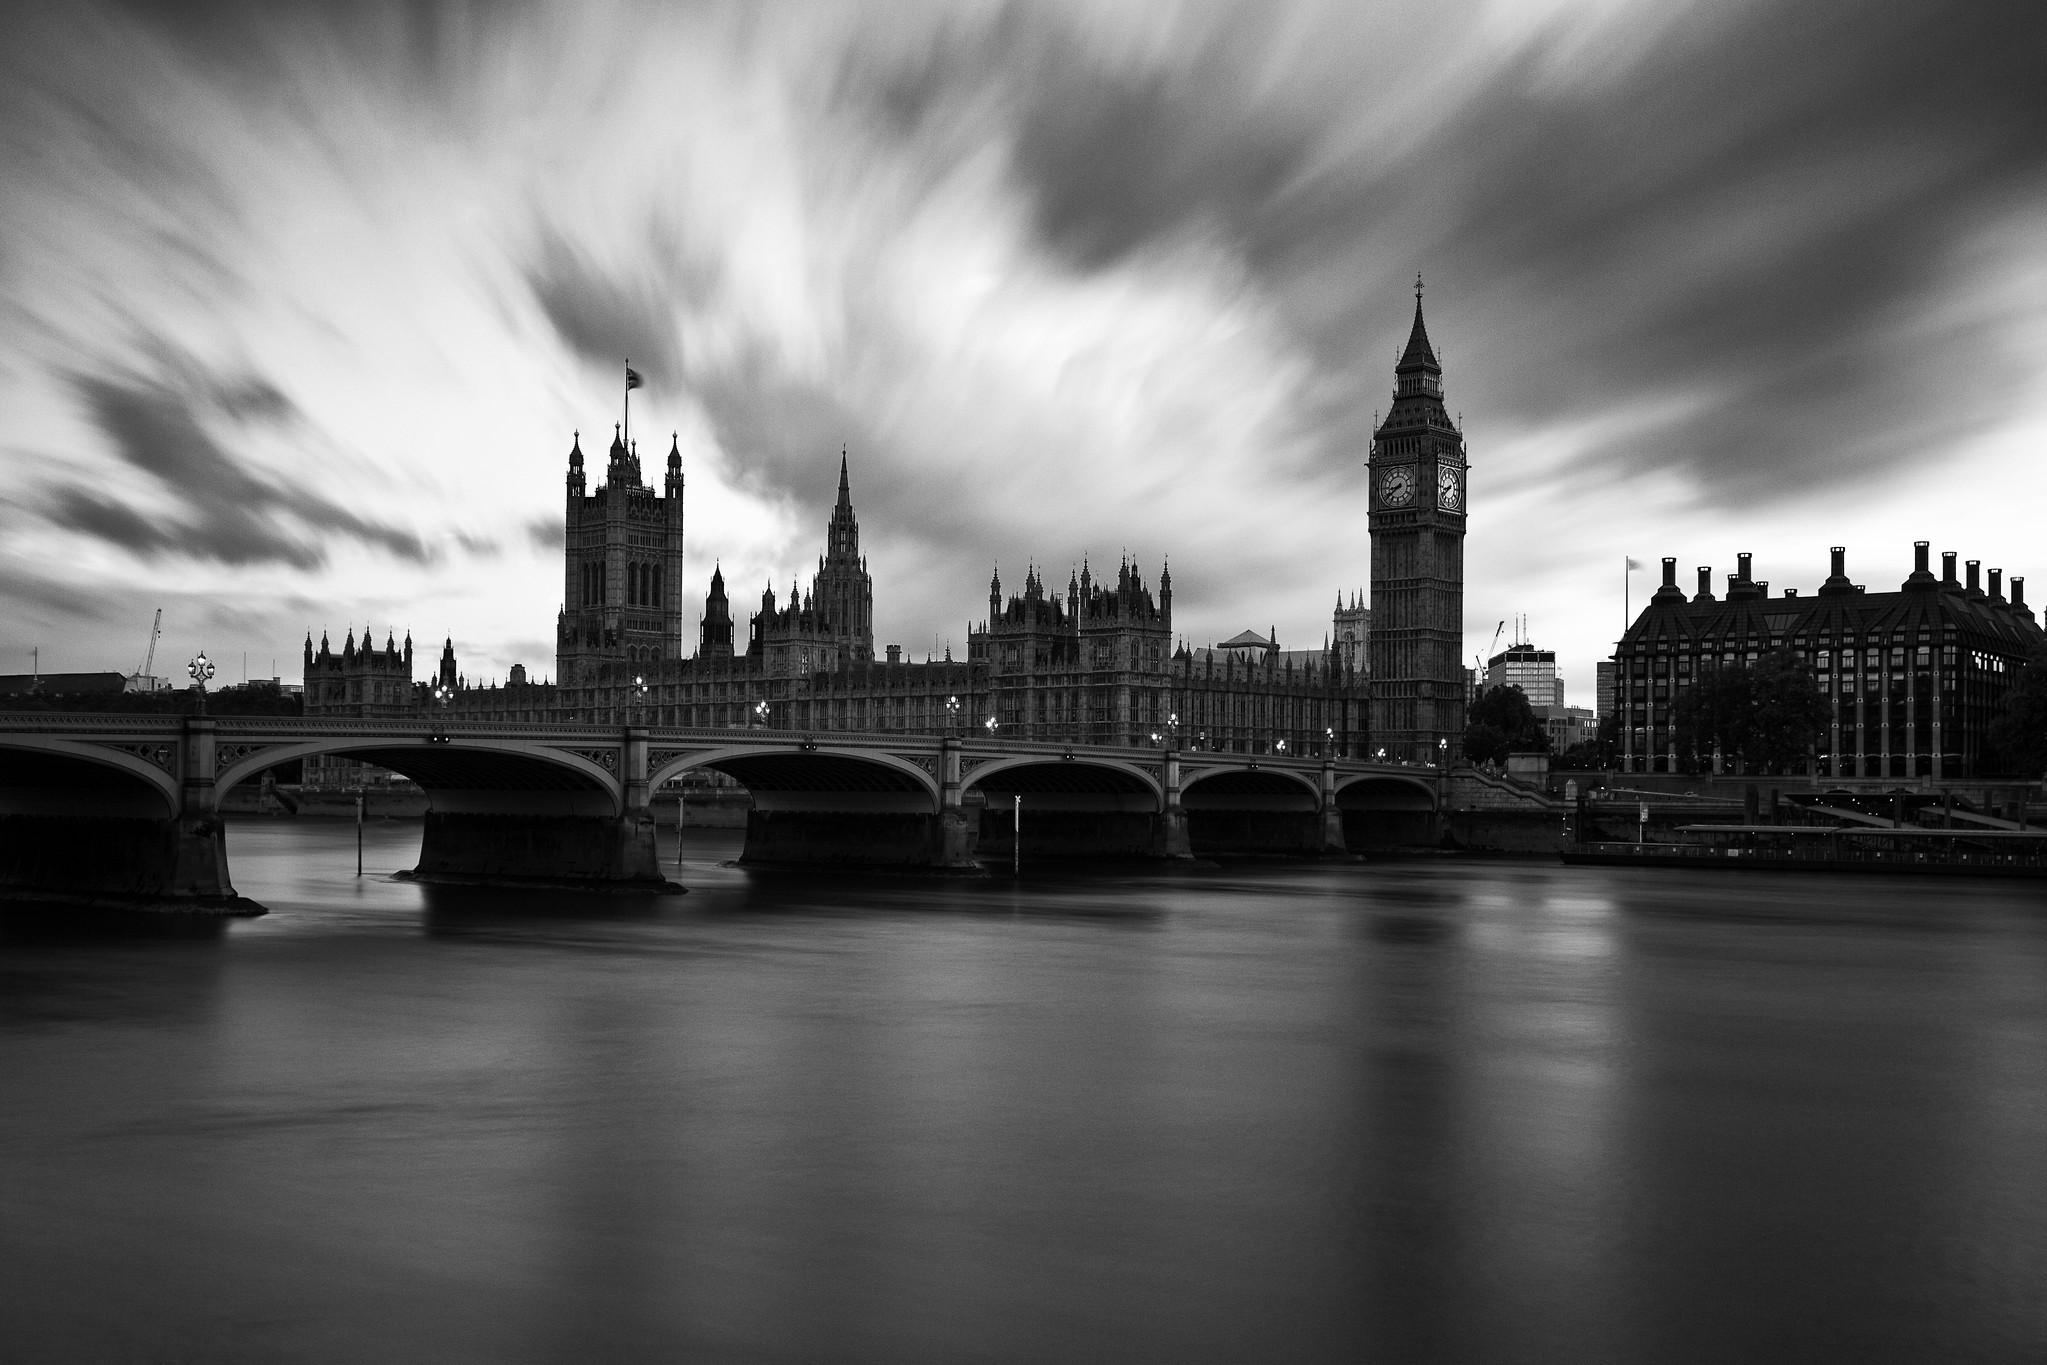 General 2047x1365 city London monochrome photography cityscape Big Ben Westminster